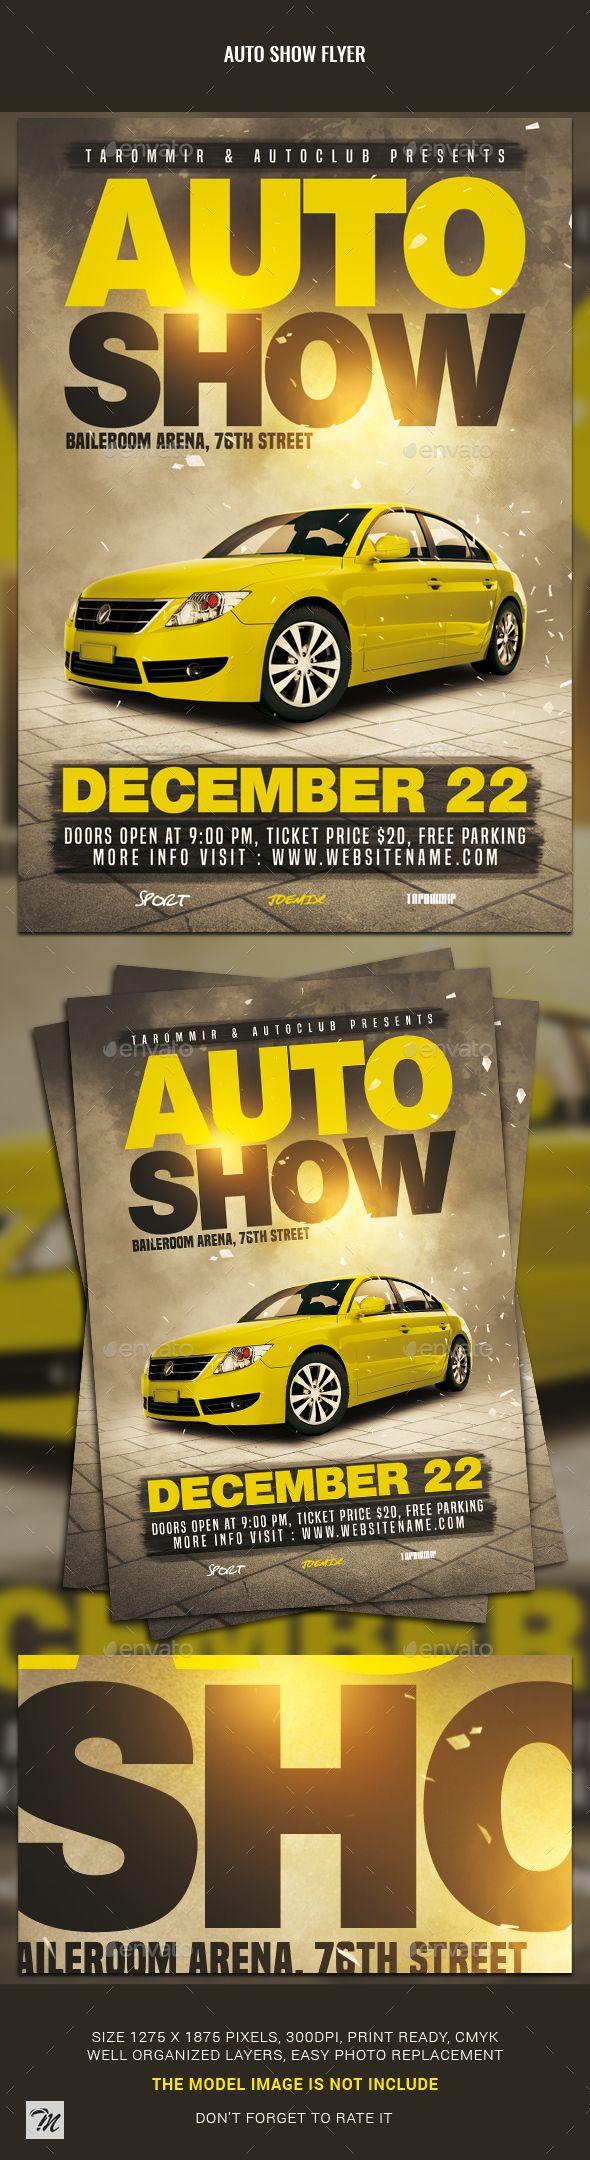 Auto Show Flyer Template Psd Easy Editable Text Event Flyer